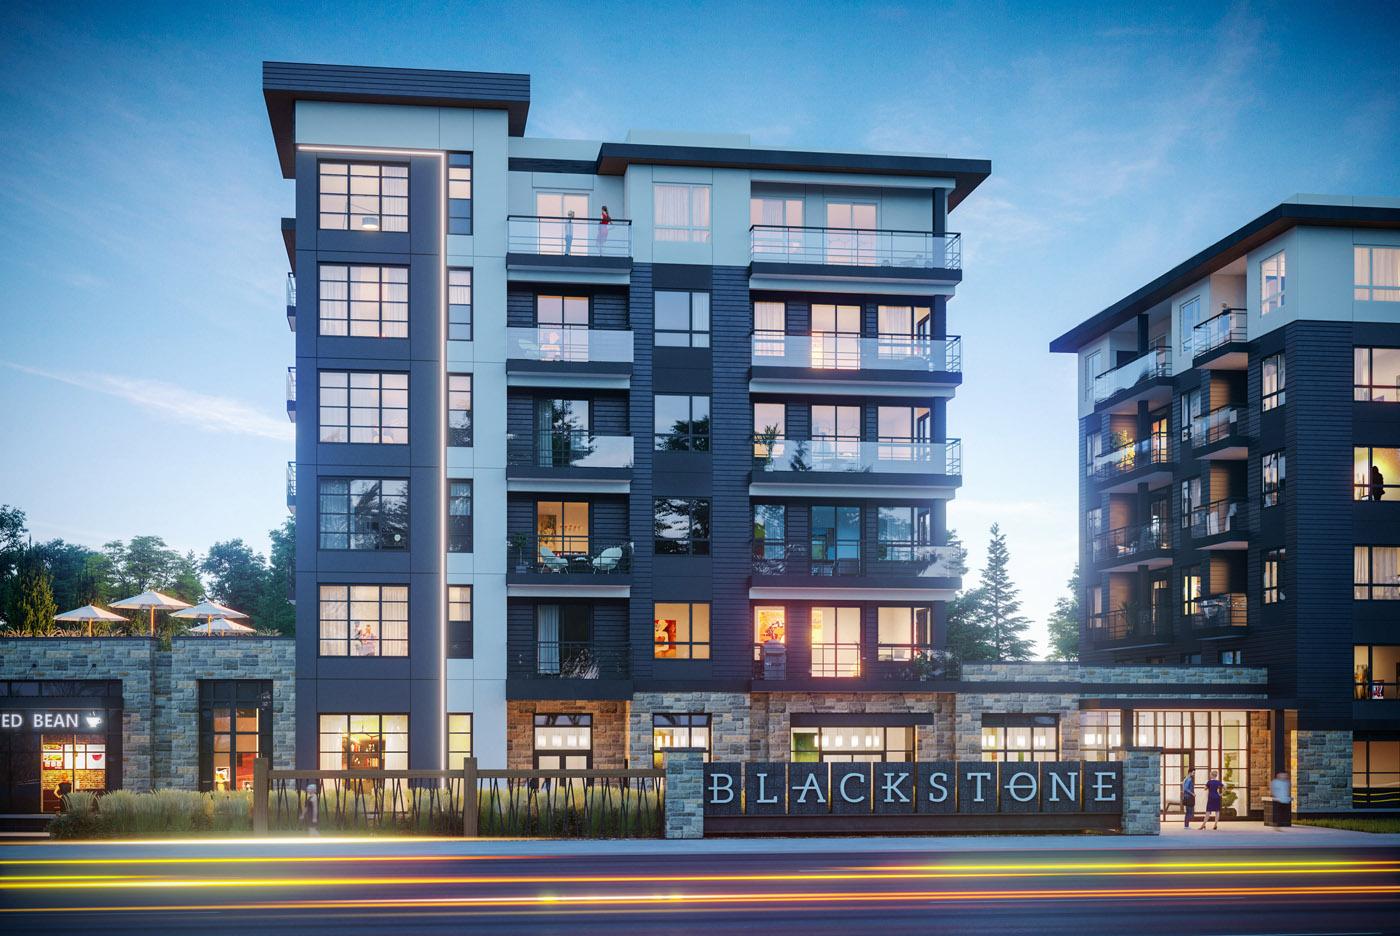 Condo Culture | Blackstone Condominiums Approved!